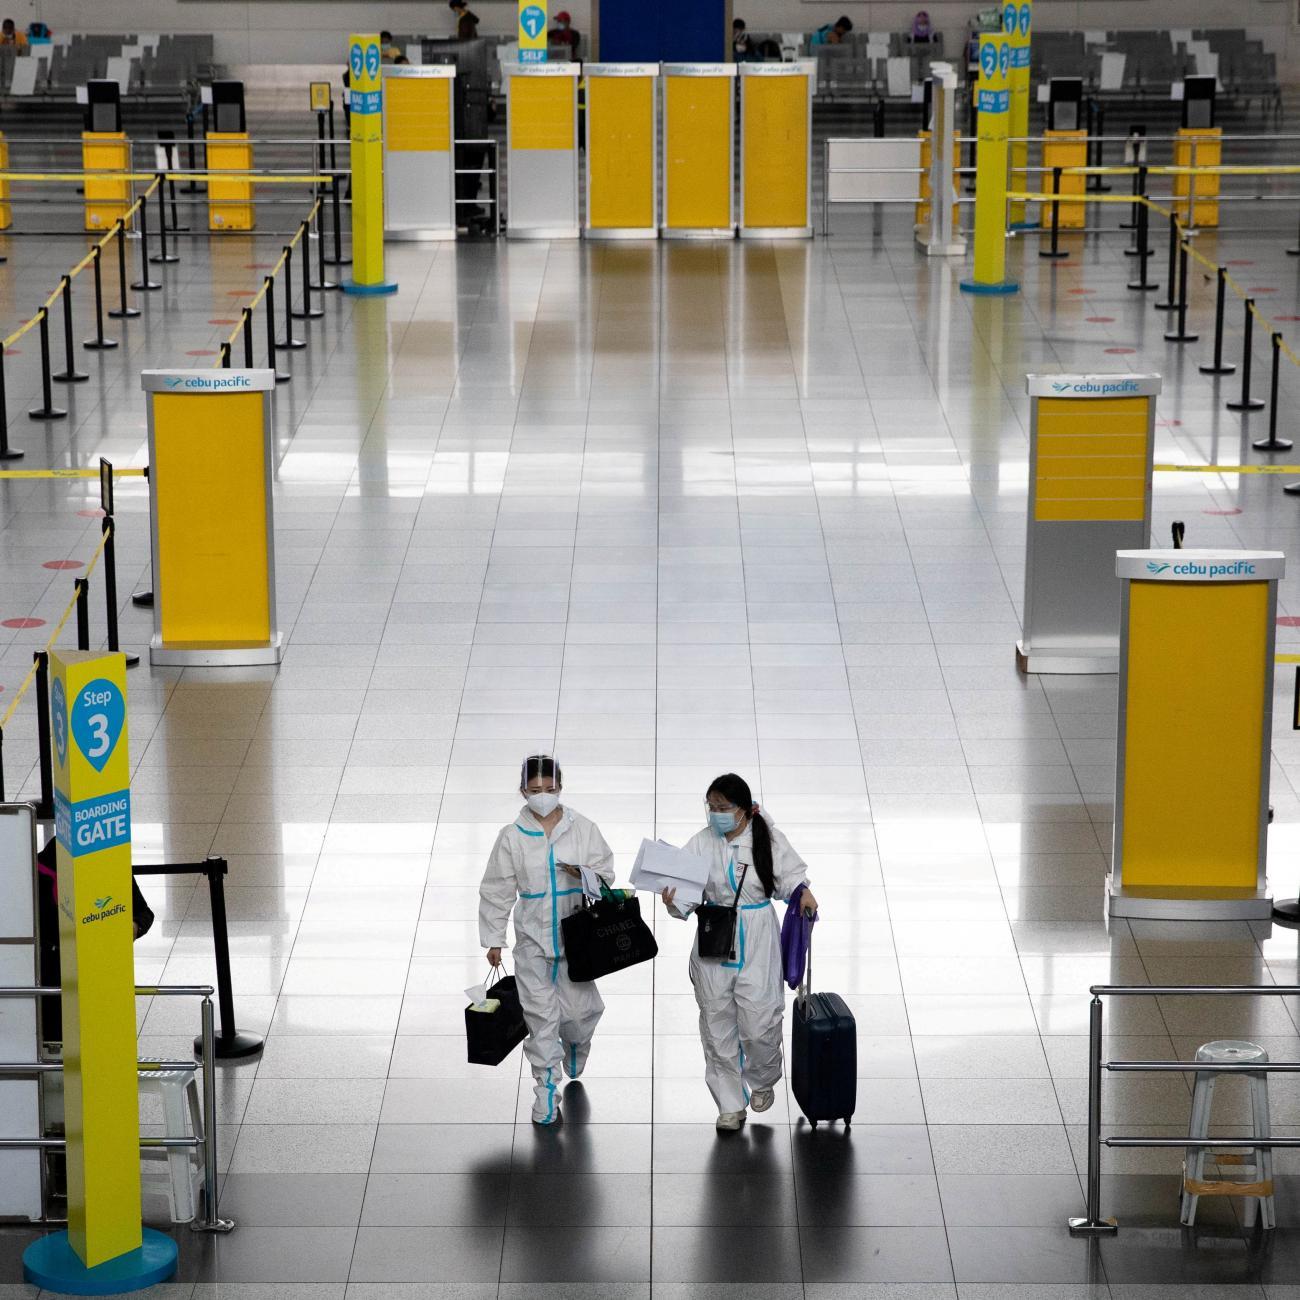 Passengers wearing hazmat suits for protection against the coronavirus disease walk inside the Ninoy Aquino International Airport in Paranaque, Metro Manila, Philippines on January 14, 2021.